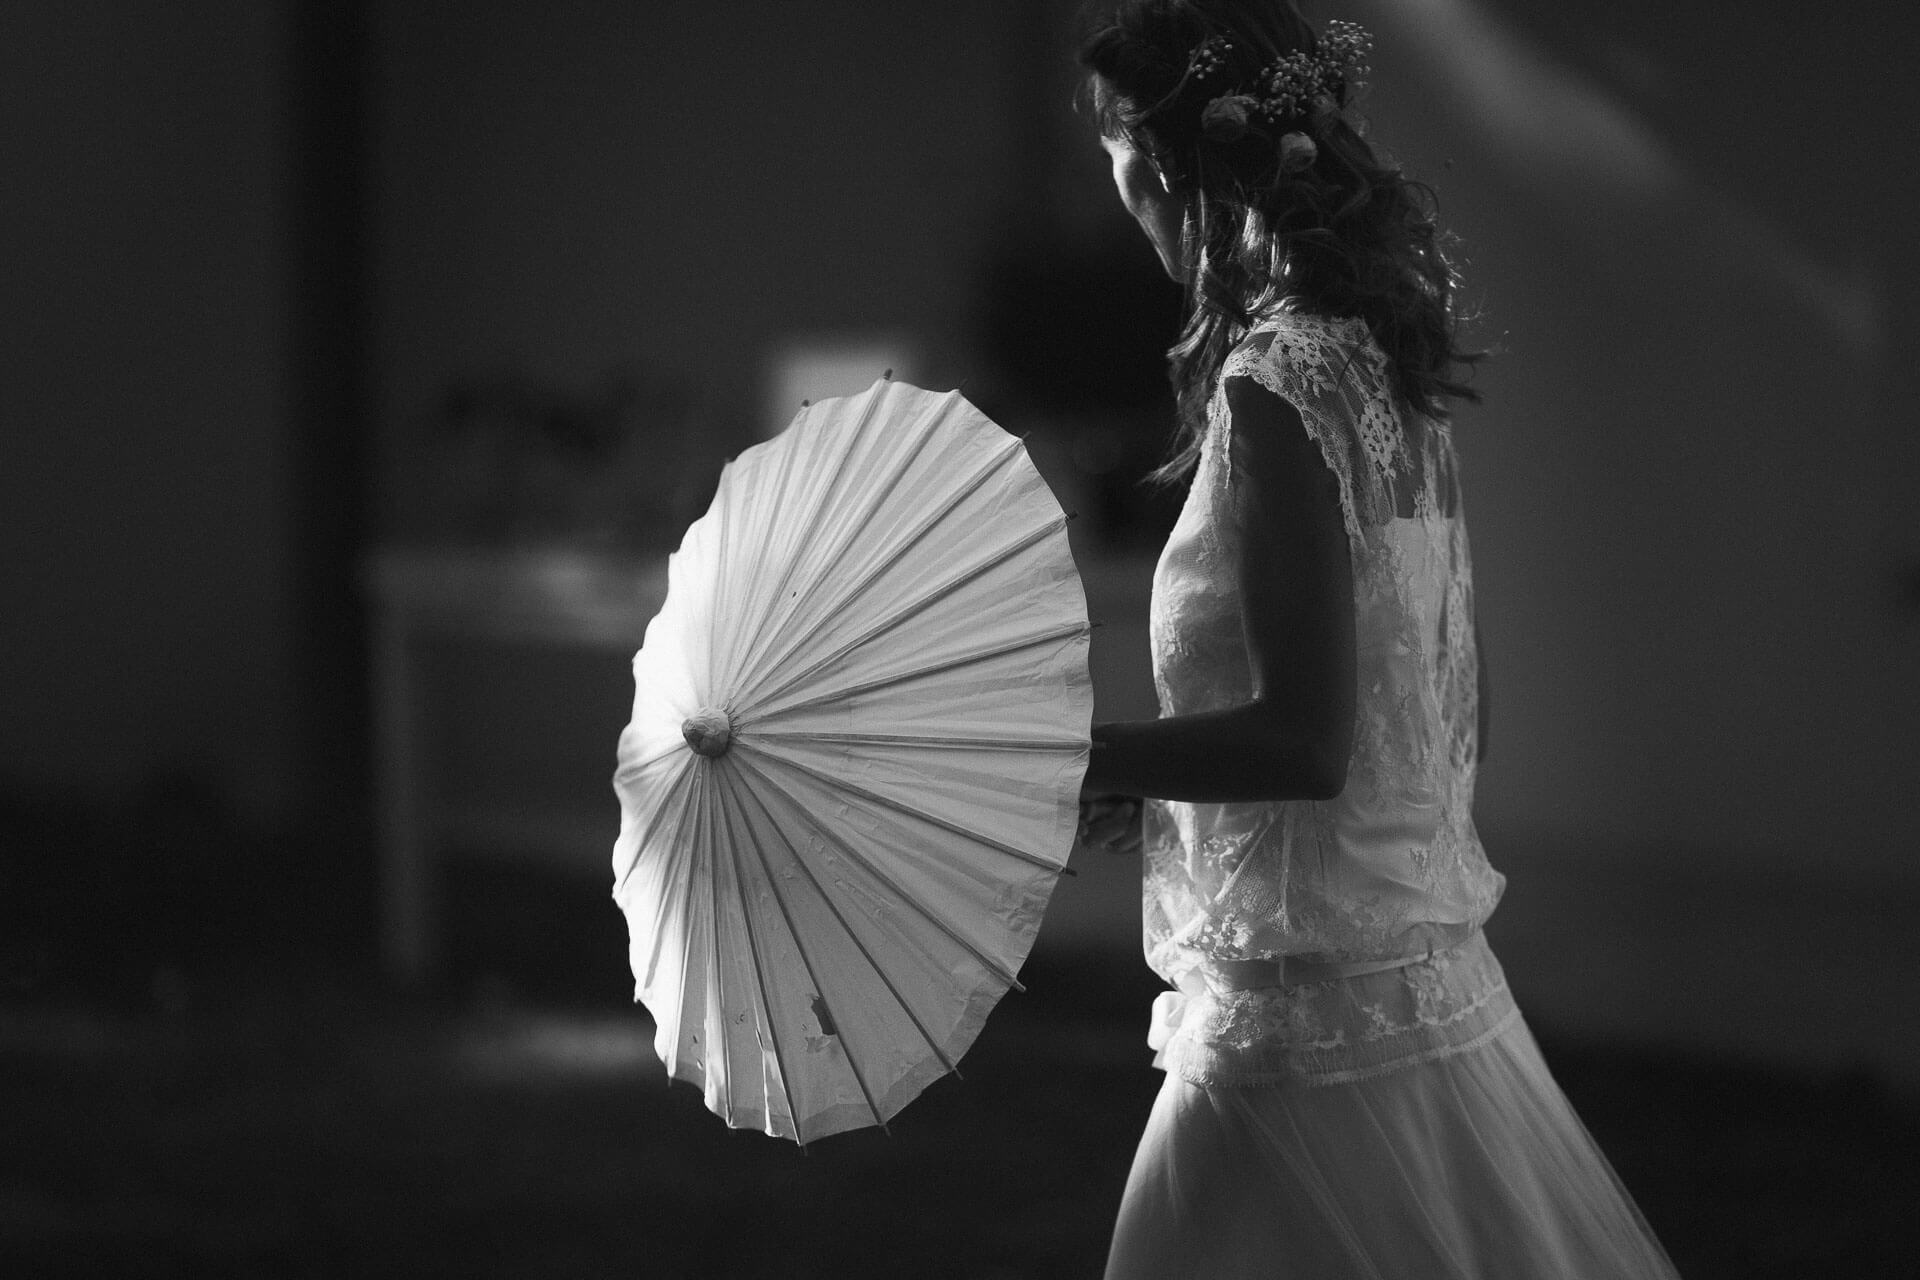 photographe-mariage-aix-en-provence-stephanie-jerome-19